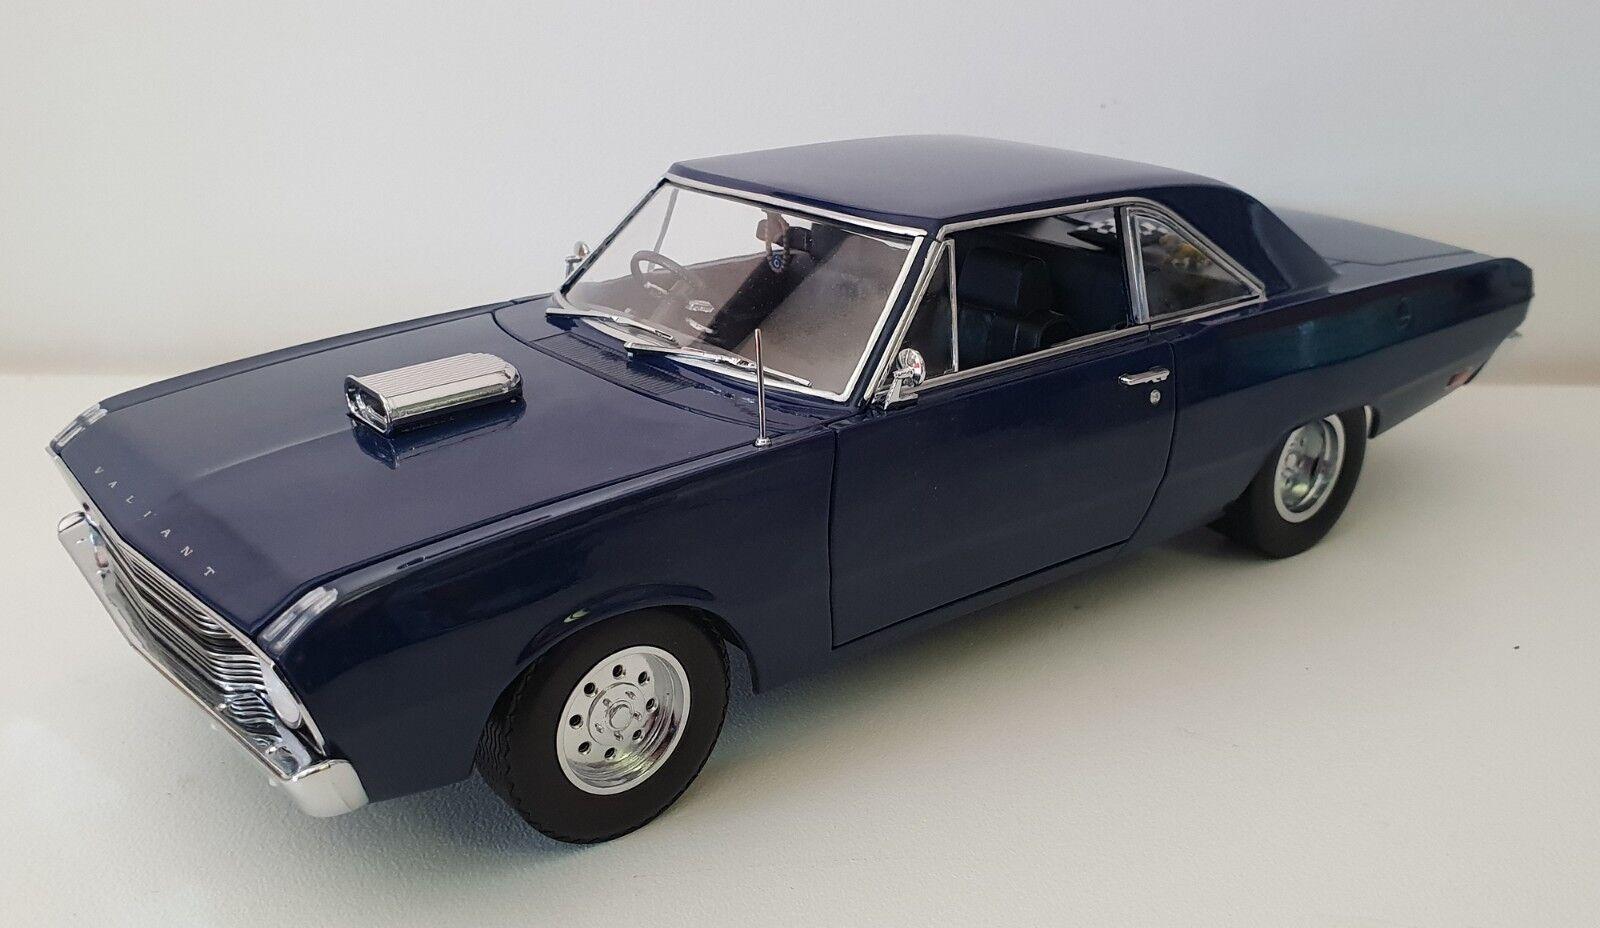 1 18 verdelight Collectibles 1969 Chrysler Valiant vf Pacer desde el niño wog